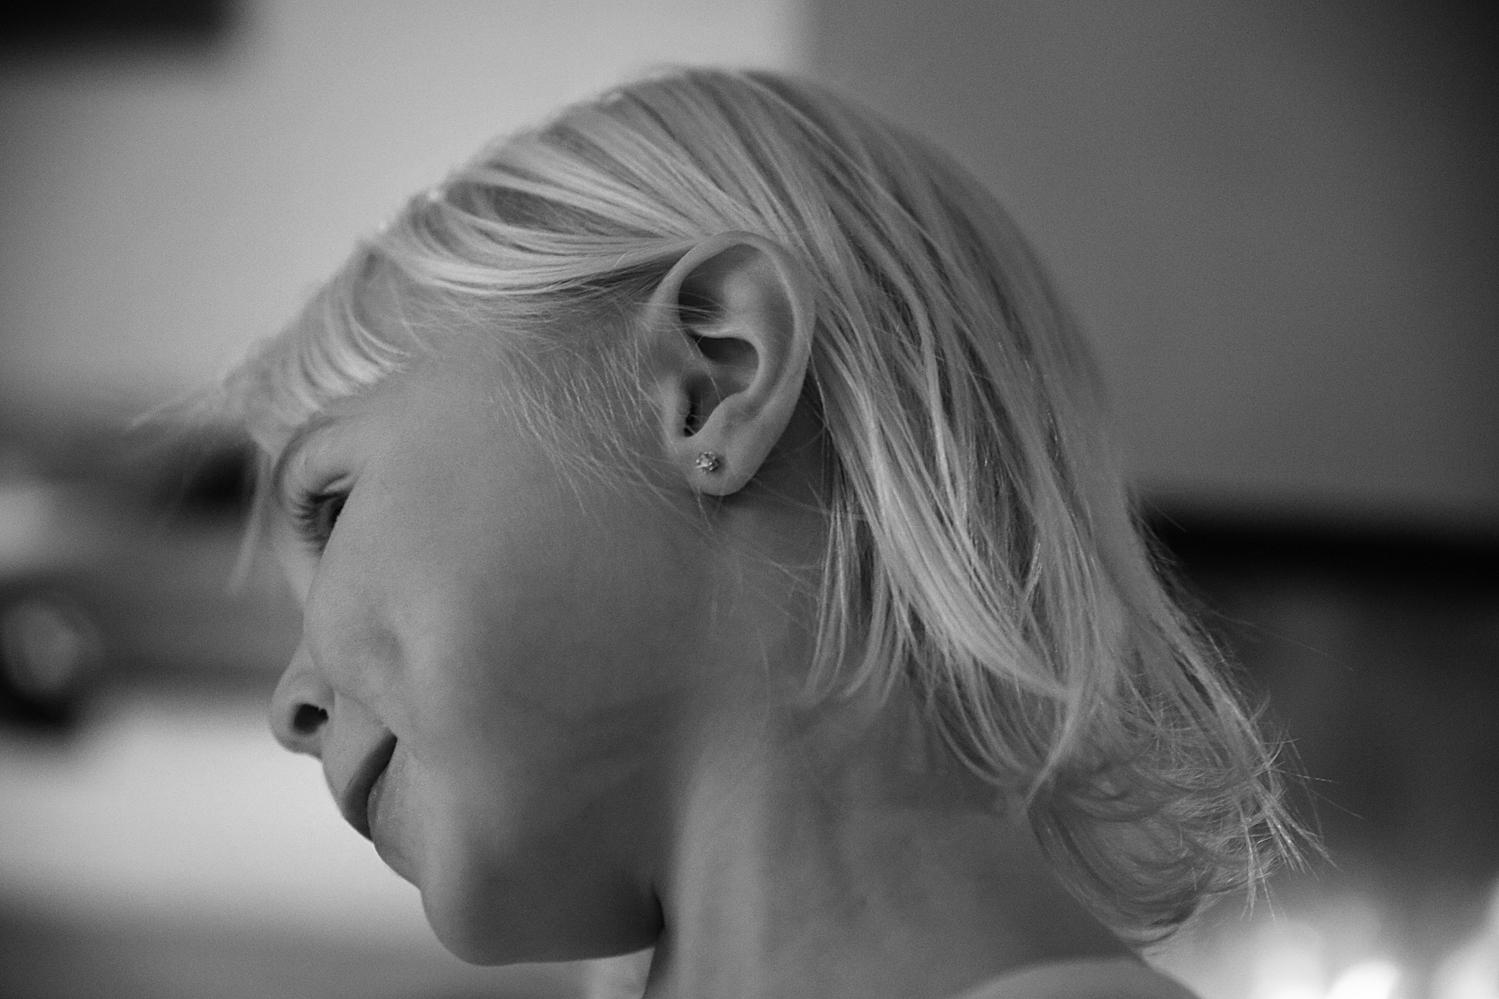 Amanda-piercing